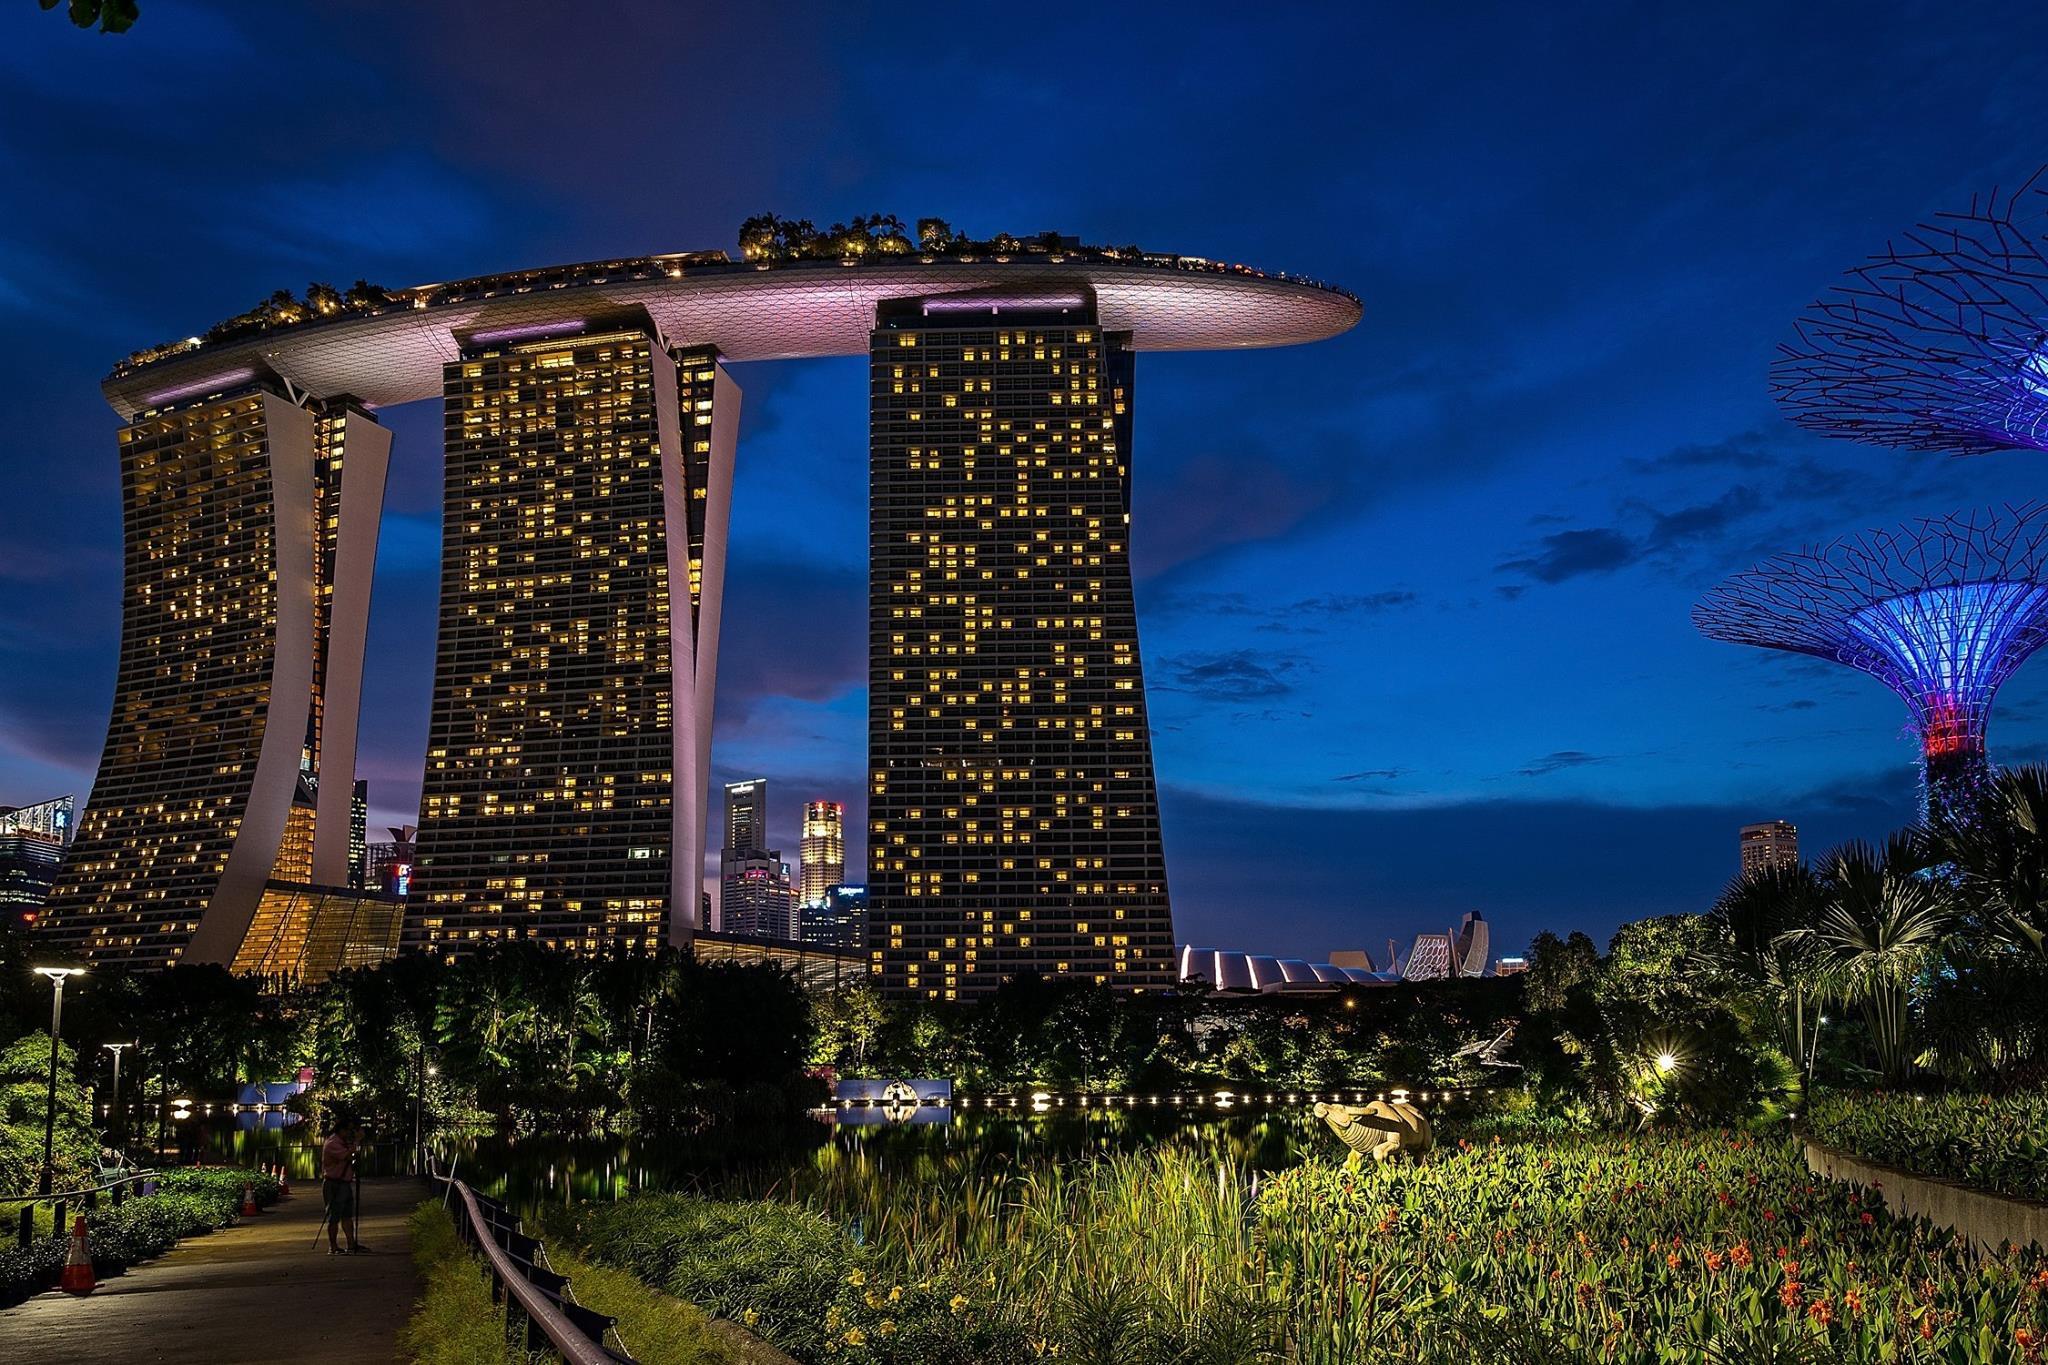 Marina Bay Sands & Garden by the Bay, Singapore